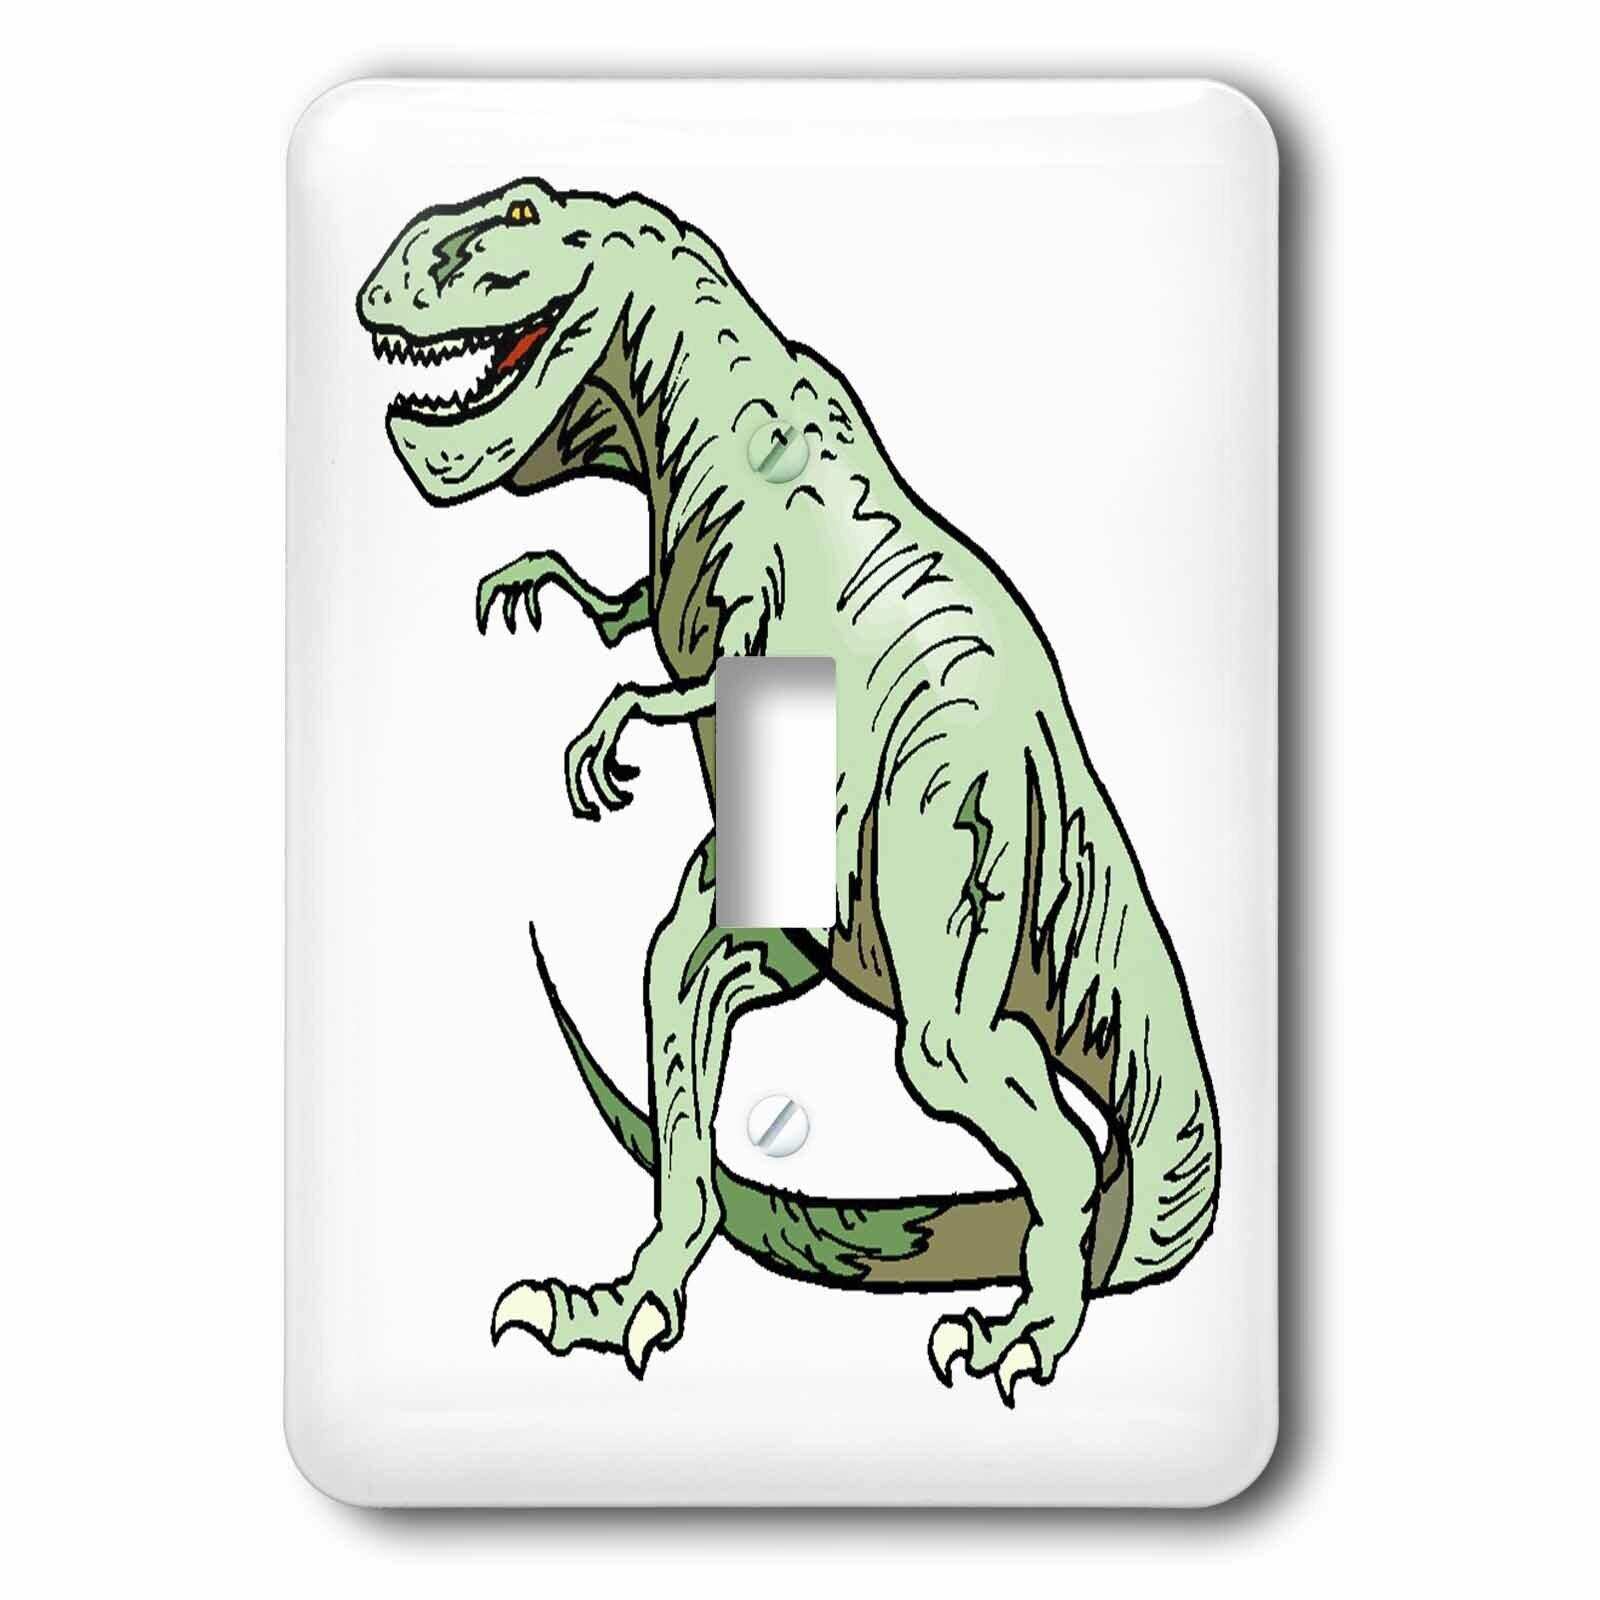 3drose Rex Dinosaur 1 Gang Toggle Light Switch Wall Plate Wayfair